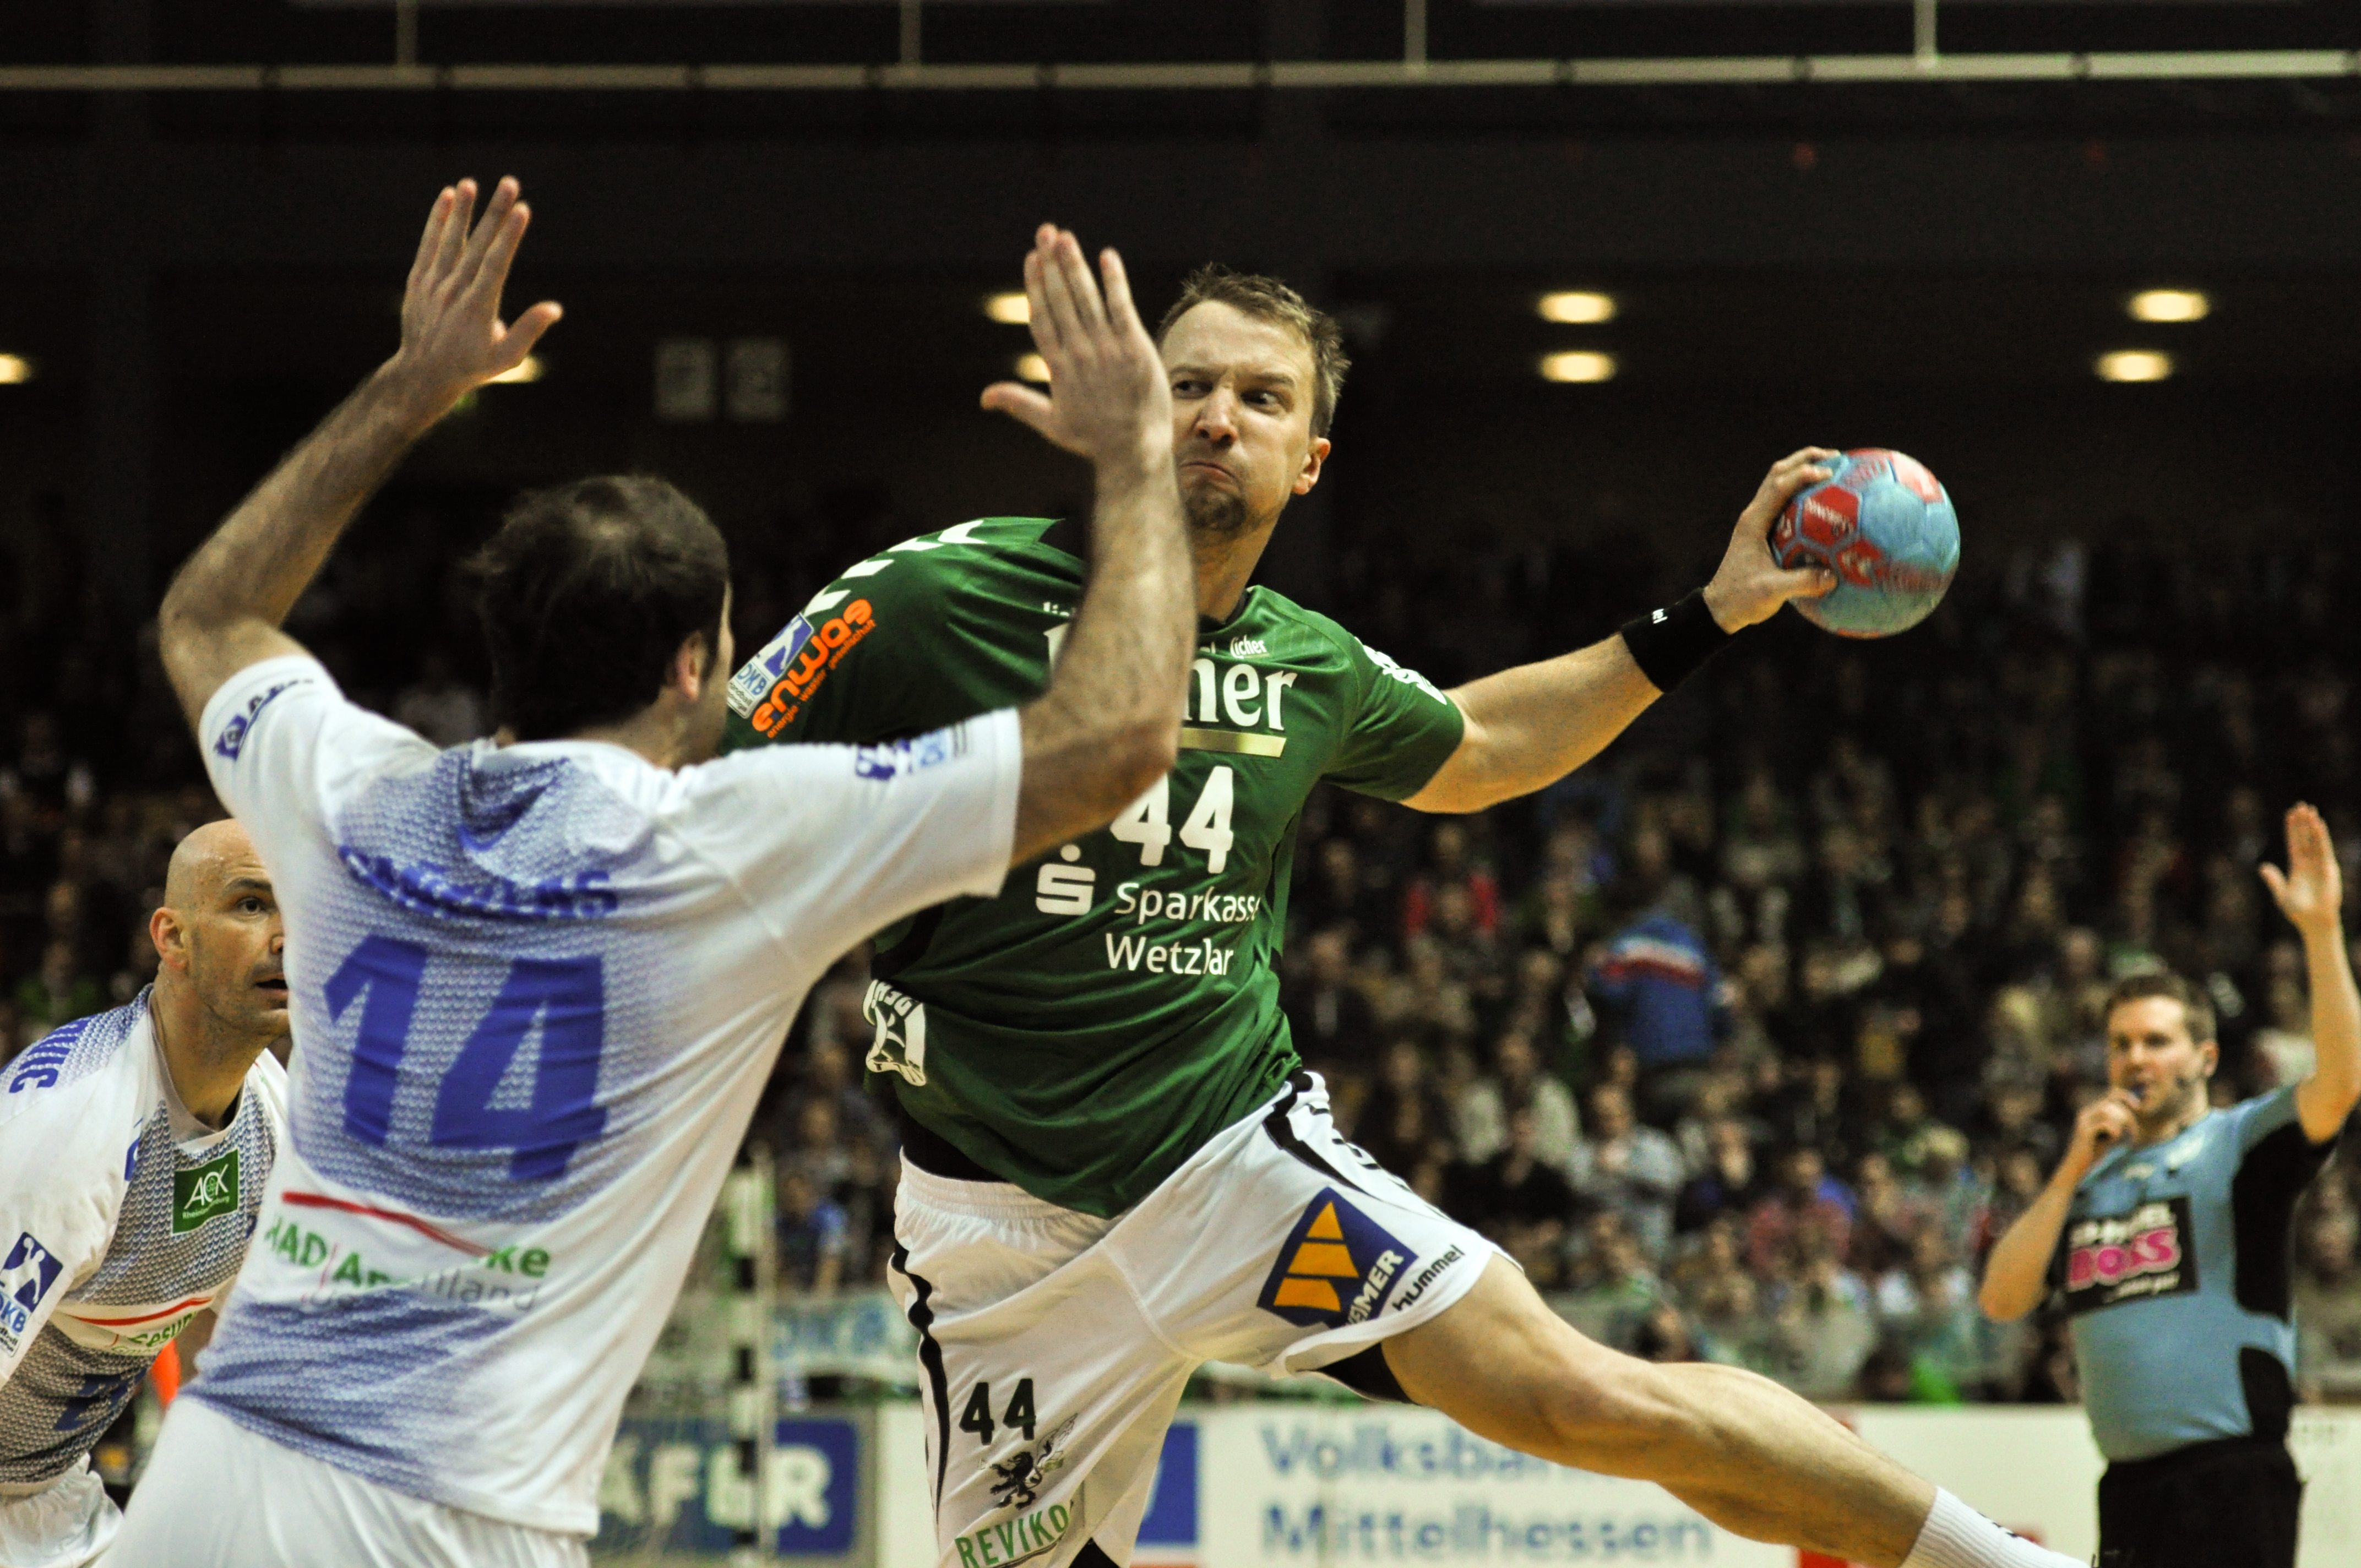 Evars_Klesniks_throwing_1_DKB_Handball_Bundesliga_HSG_Wetzlar_vs_HSV_Hamburg_2014-02_08_013